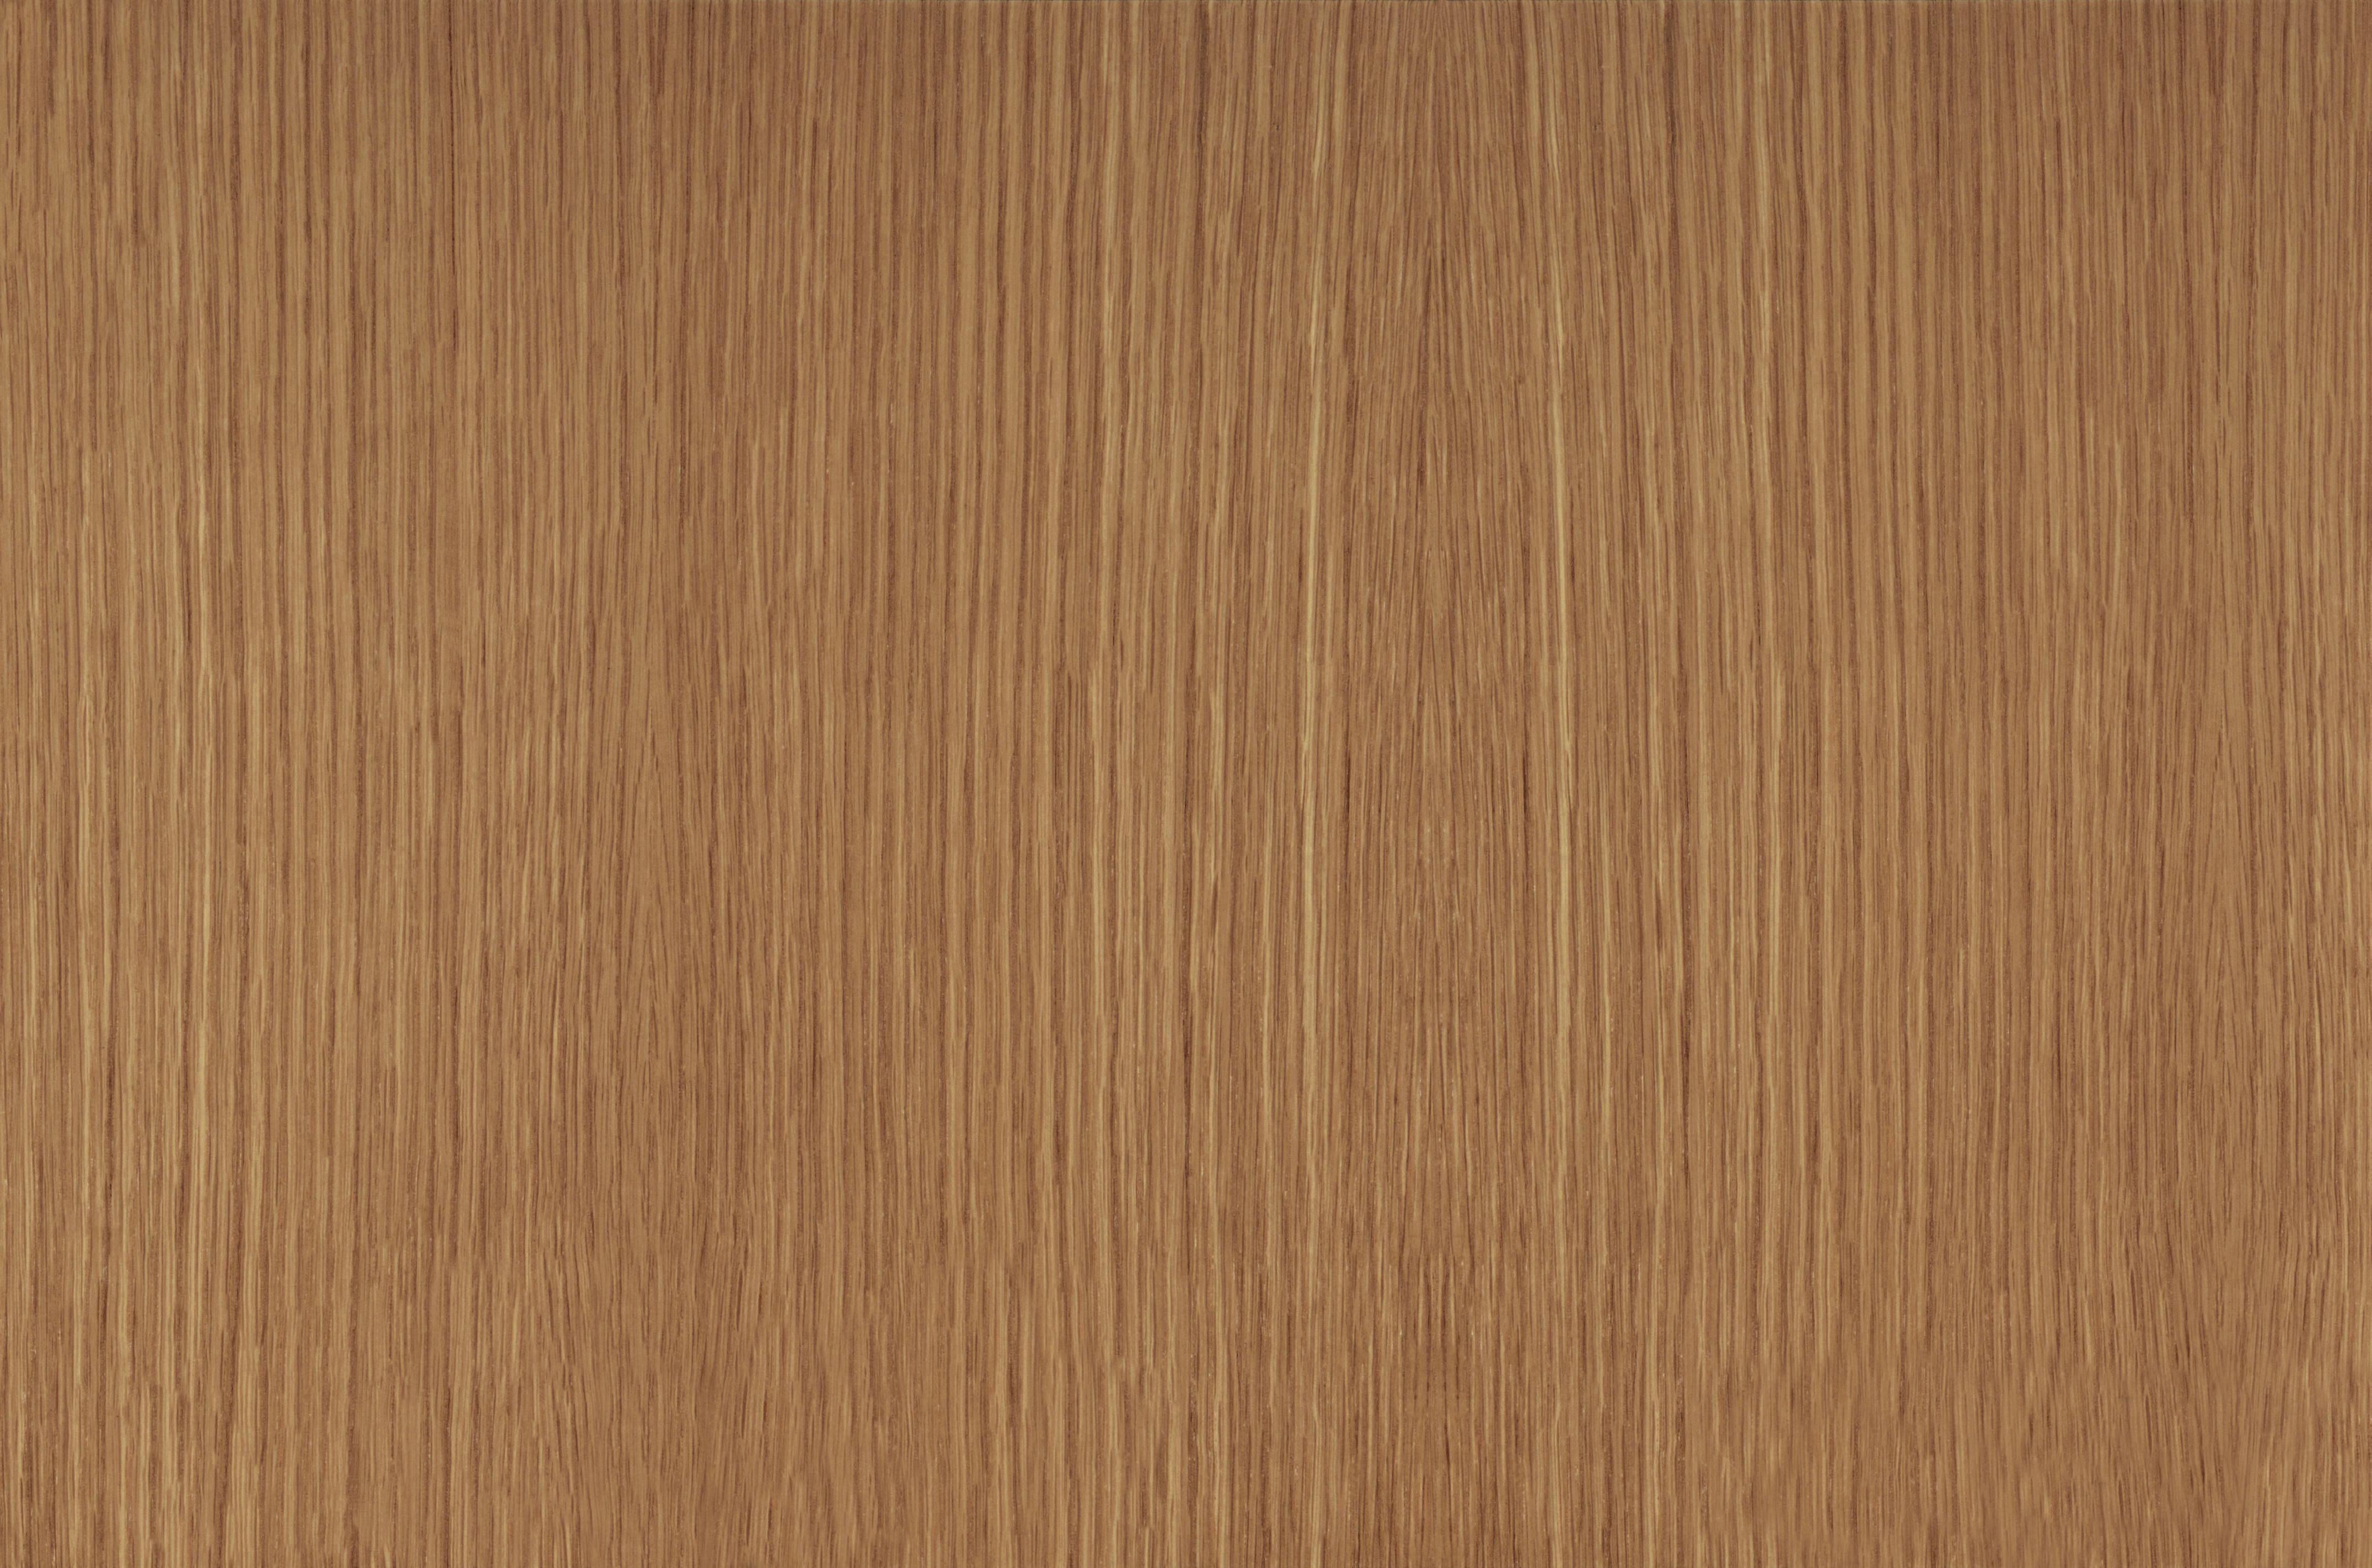 American White Oak (Riftcut) Wooden textures